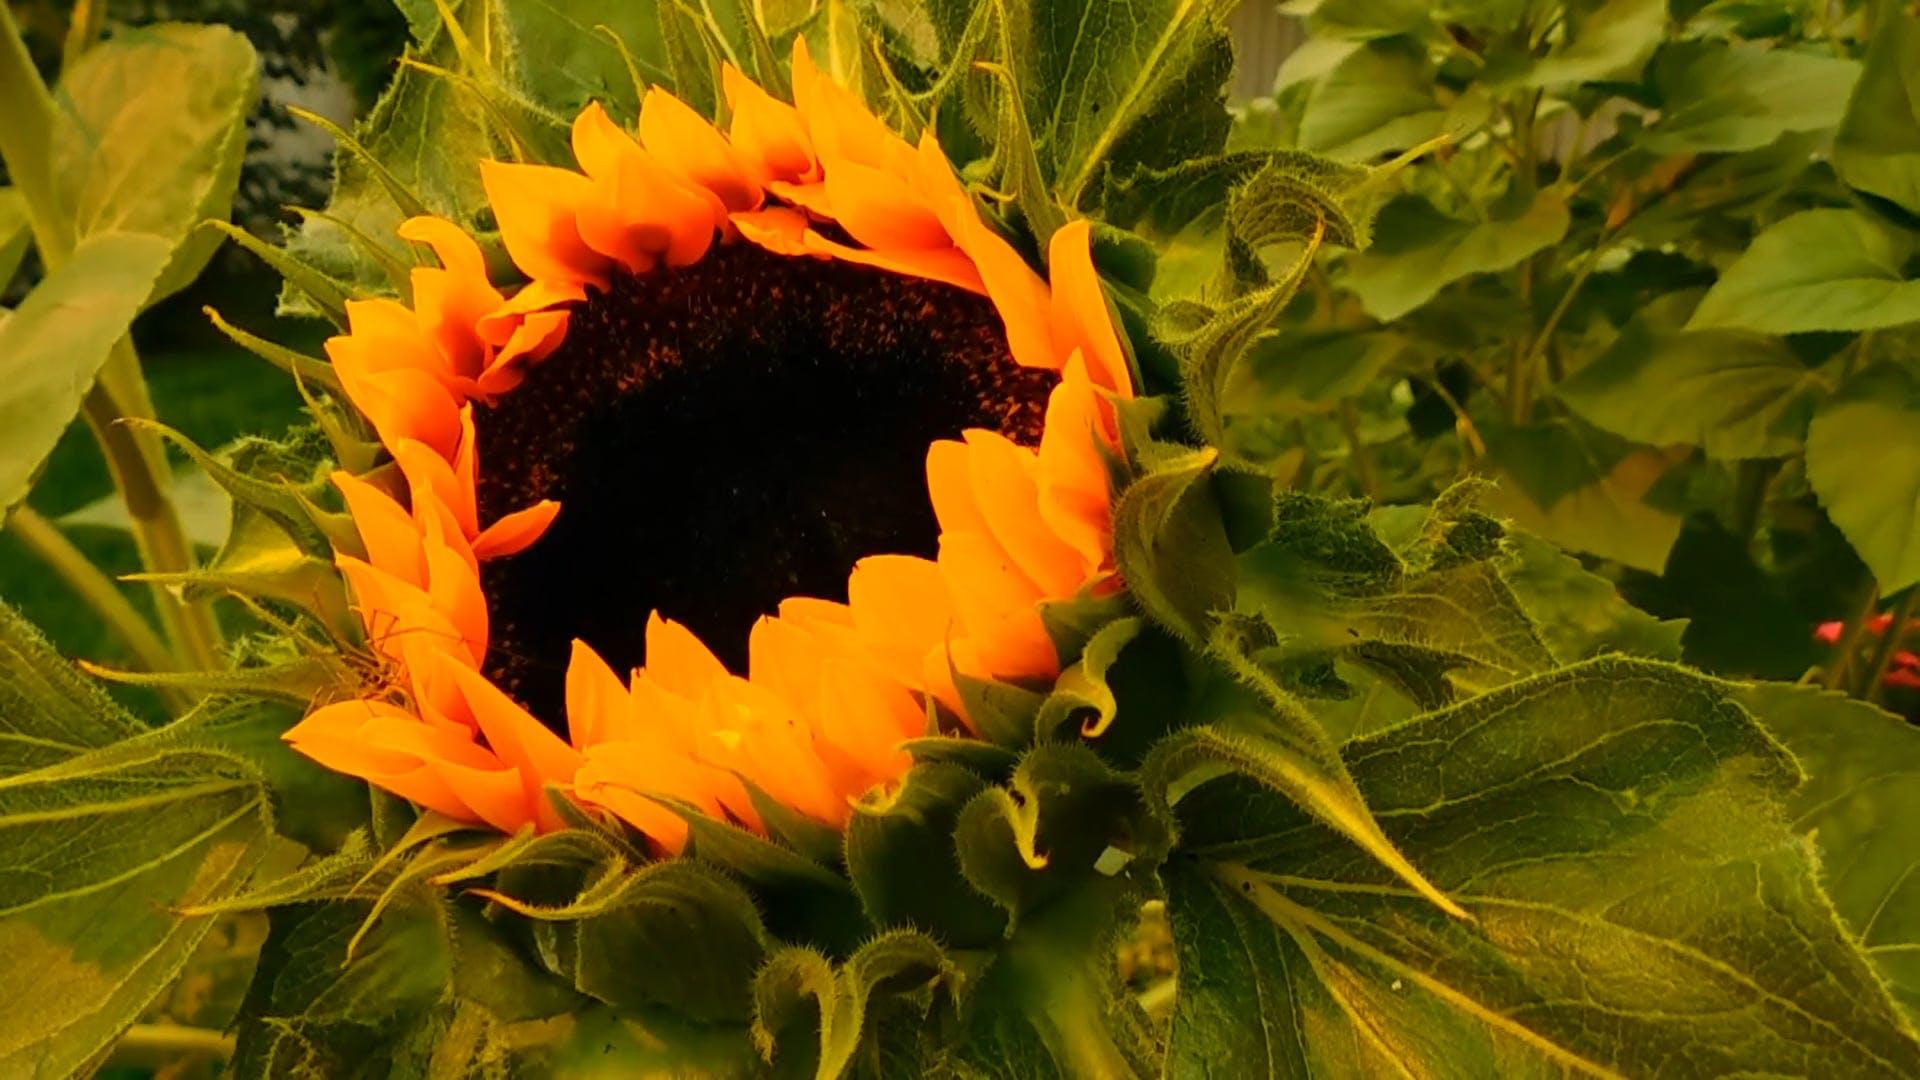 Sunflower Begins to Bloom